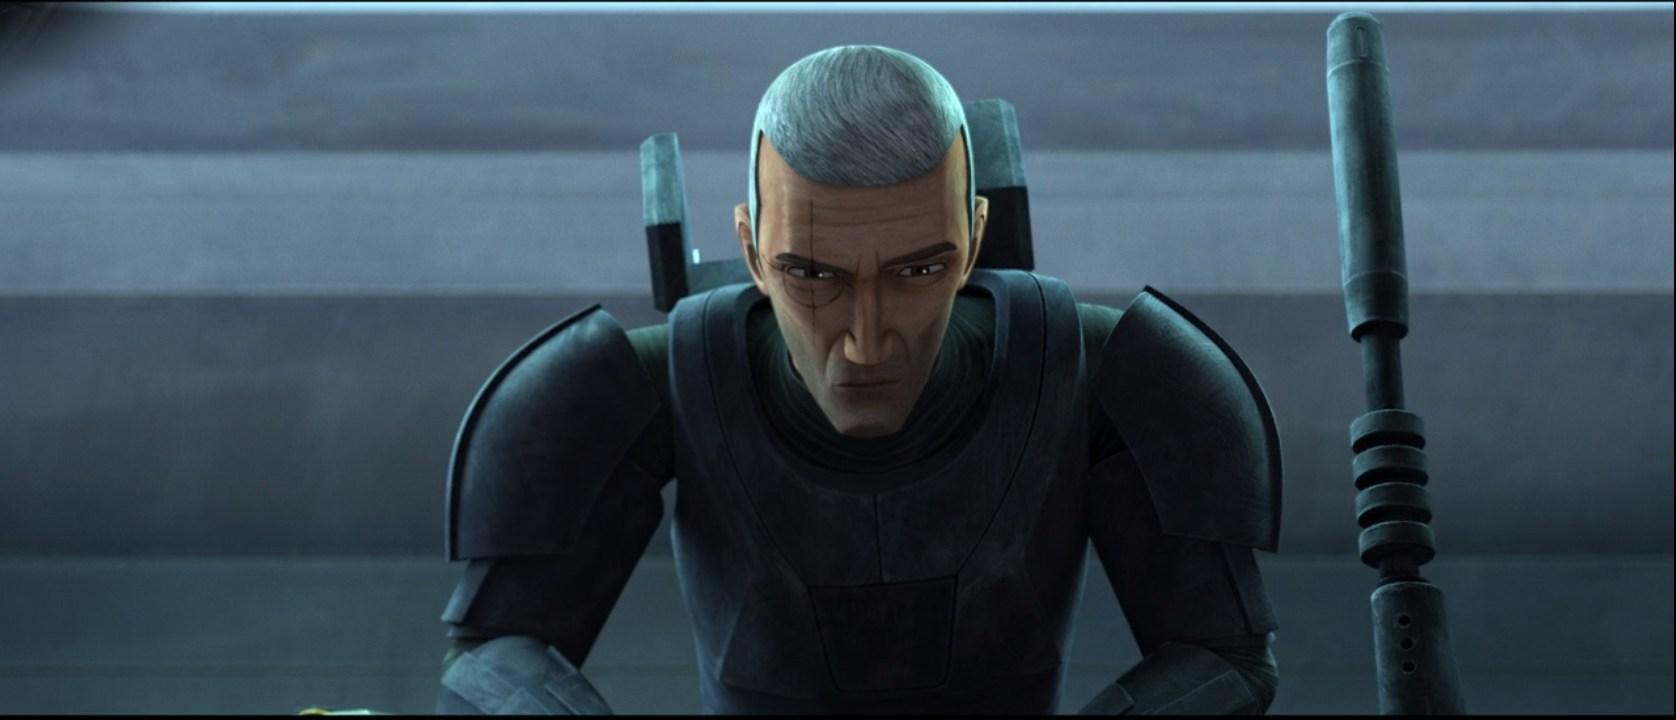 Star Wars: The Bad Batch Episode 3-Crosshair is Bitter